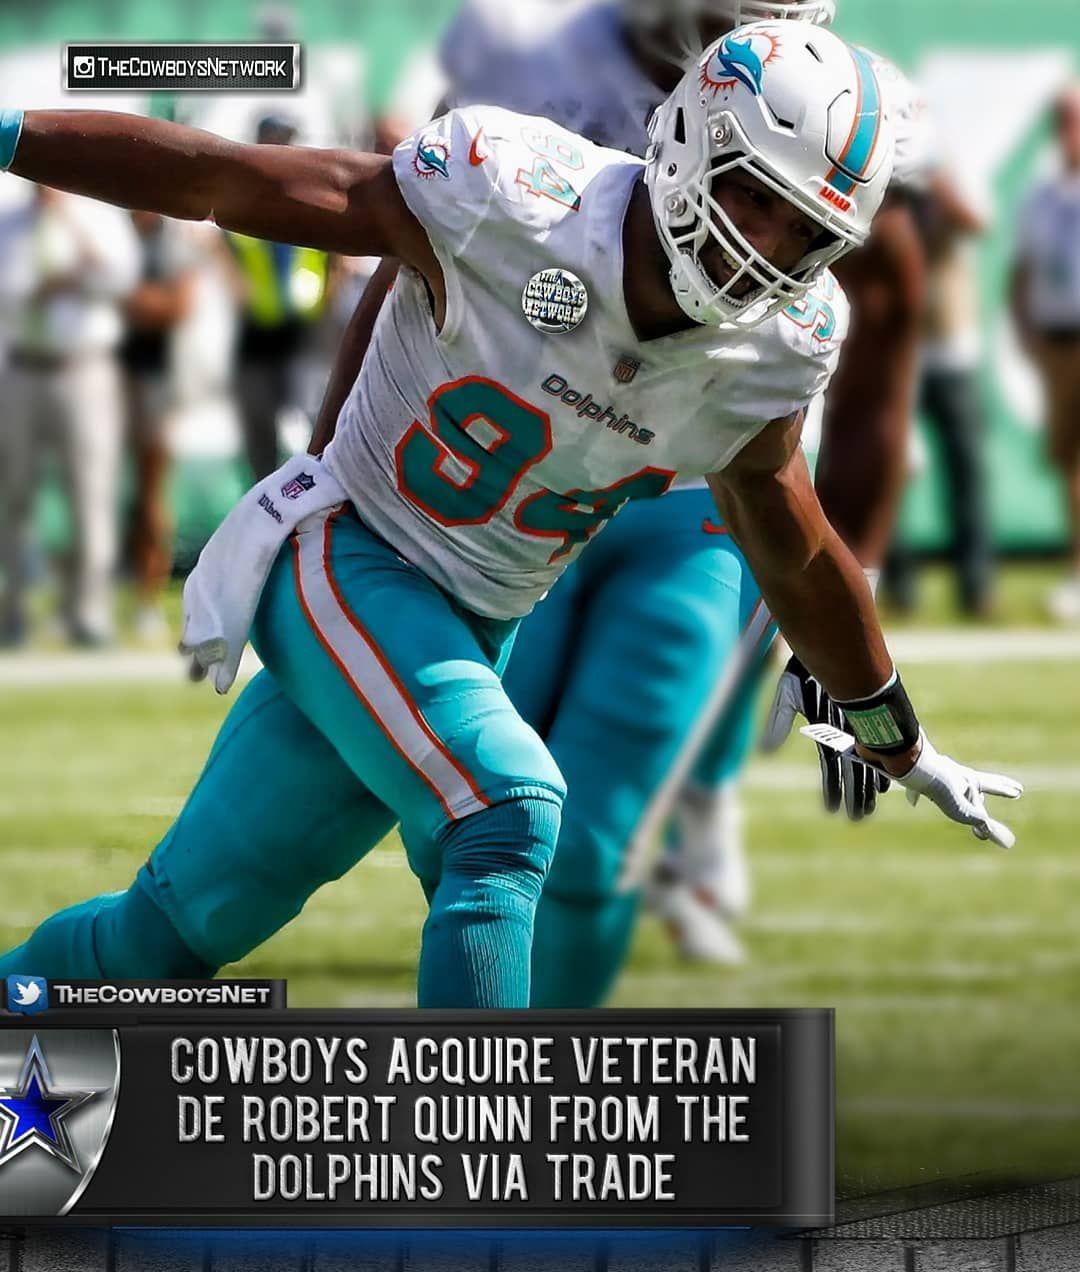 The Dallas Cowboys Network On Instagram C O W B O Y S B U Z Z The Cowboys Have Agreed To Acquire De Robert Quinn Fr Dallas Cowboys Miami Dolphins Cowboys